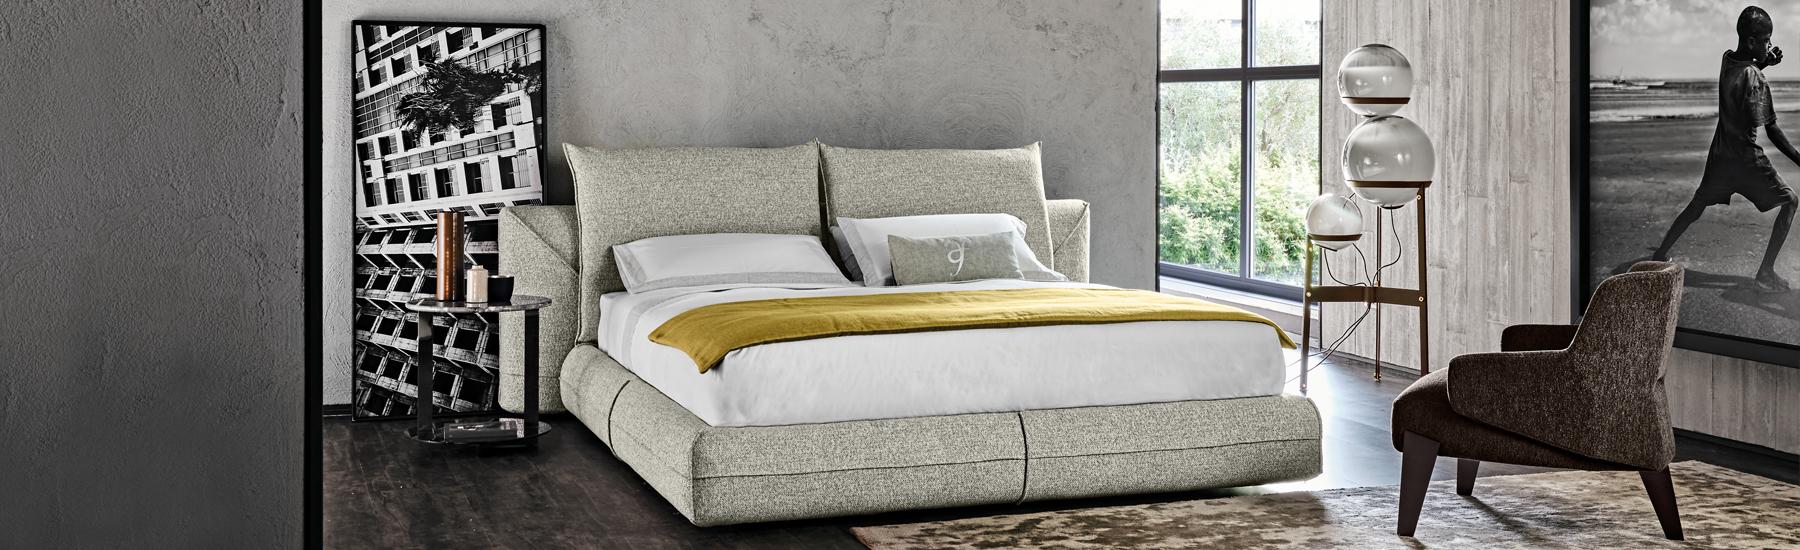 Starman Bed